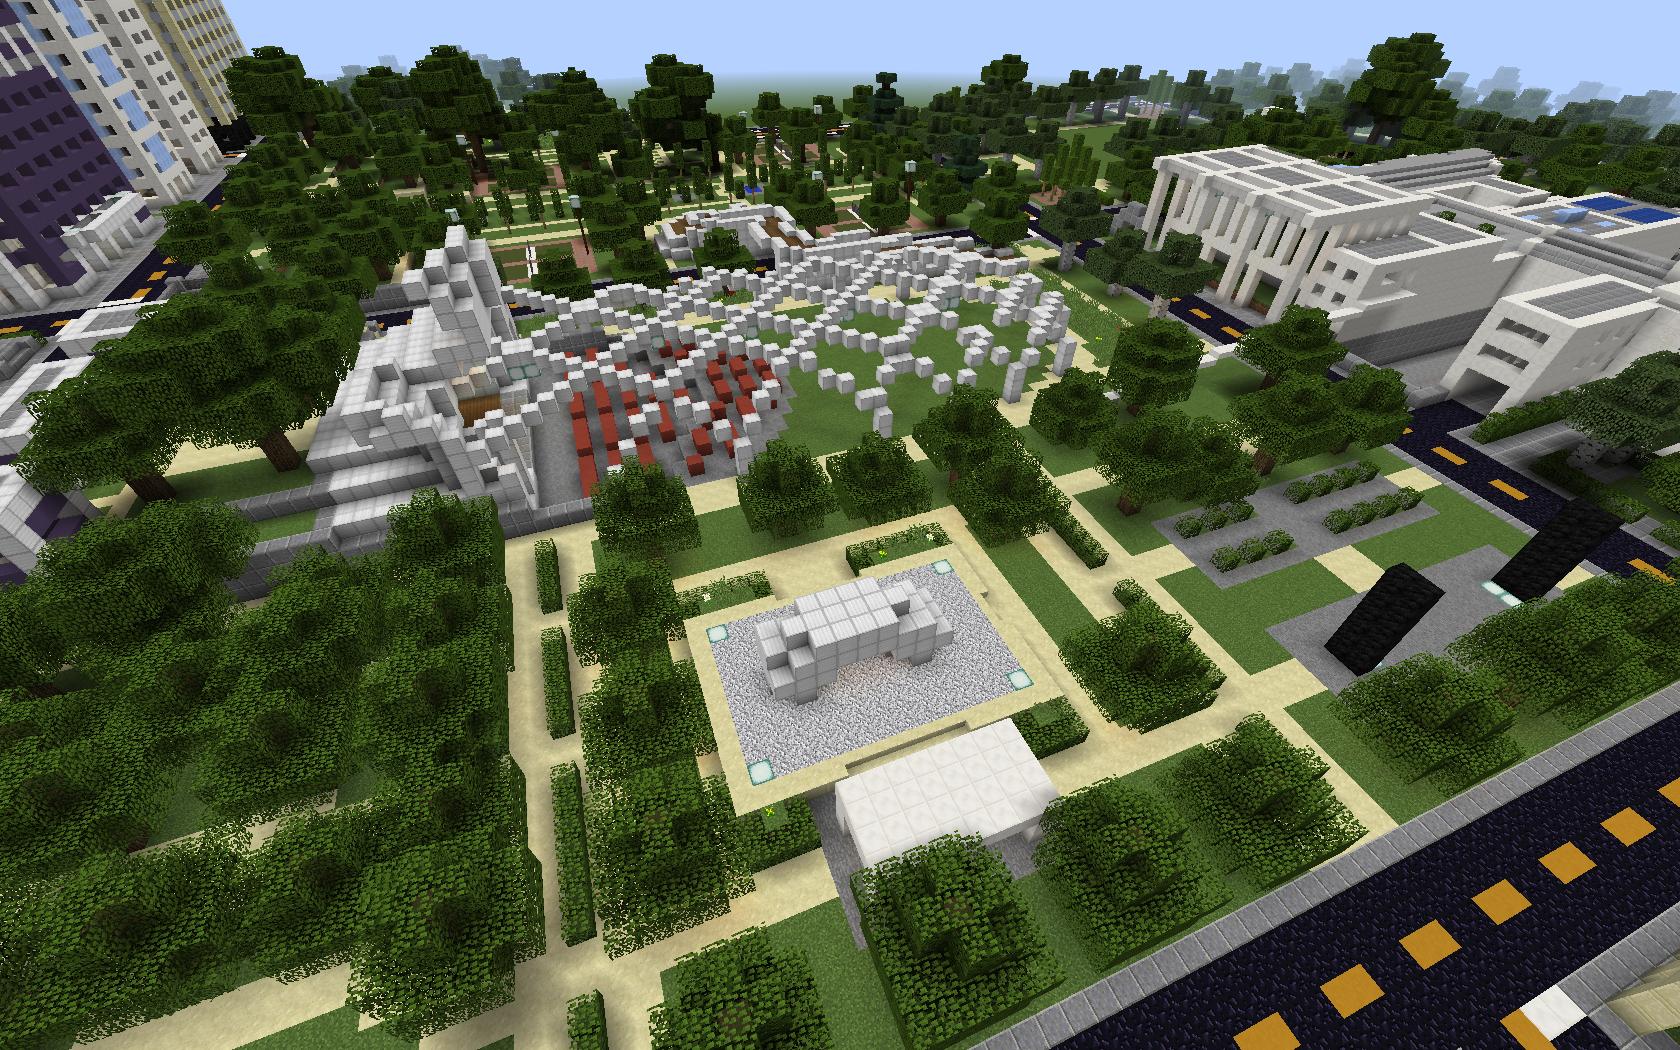 minecraft challenge redesign a public space discoverdesign